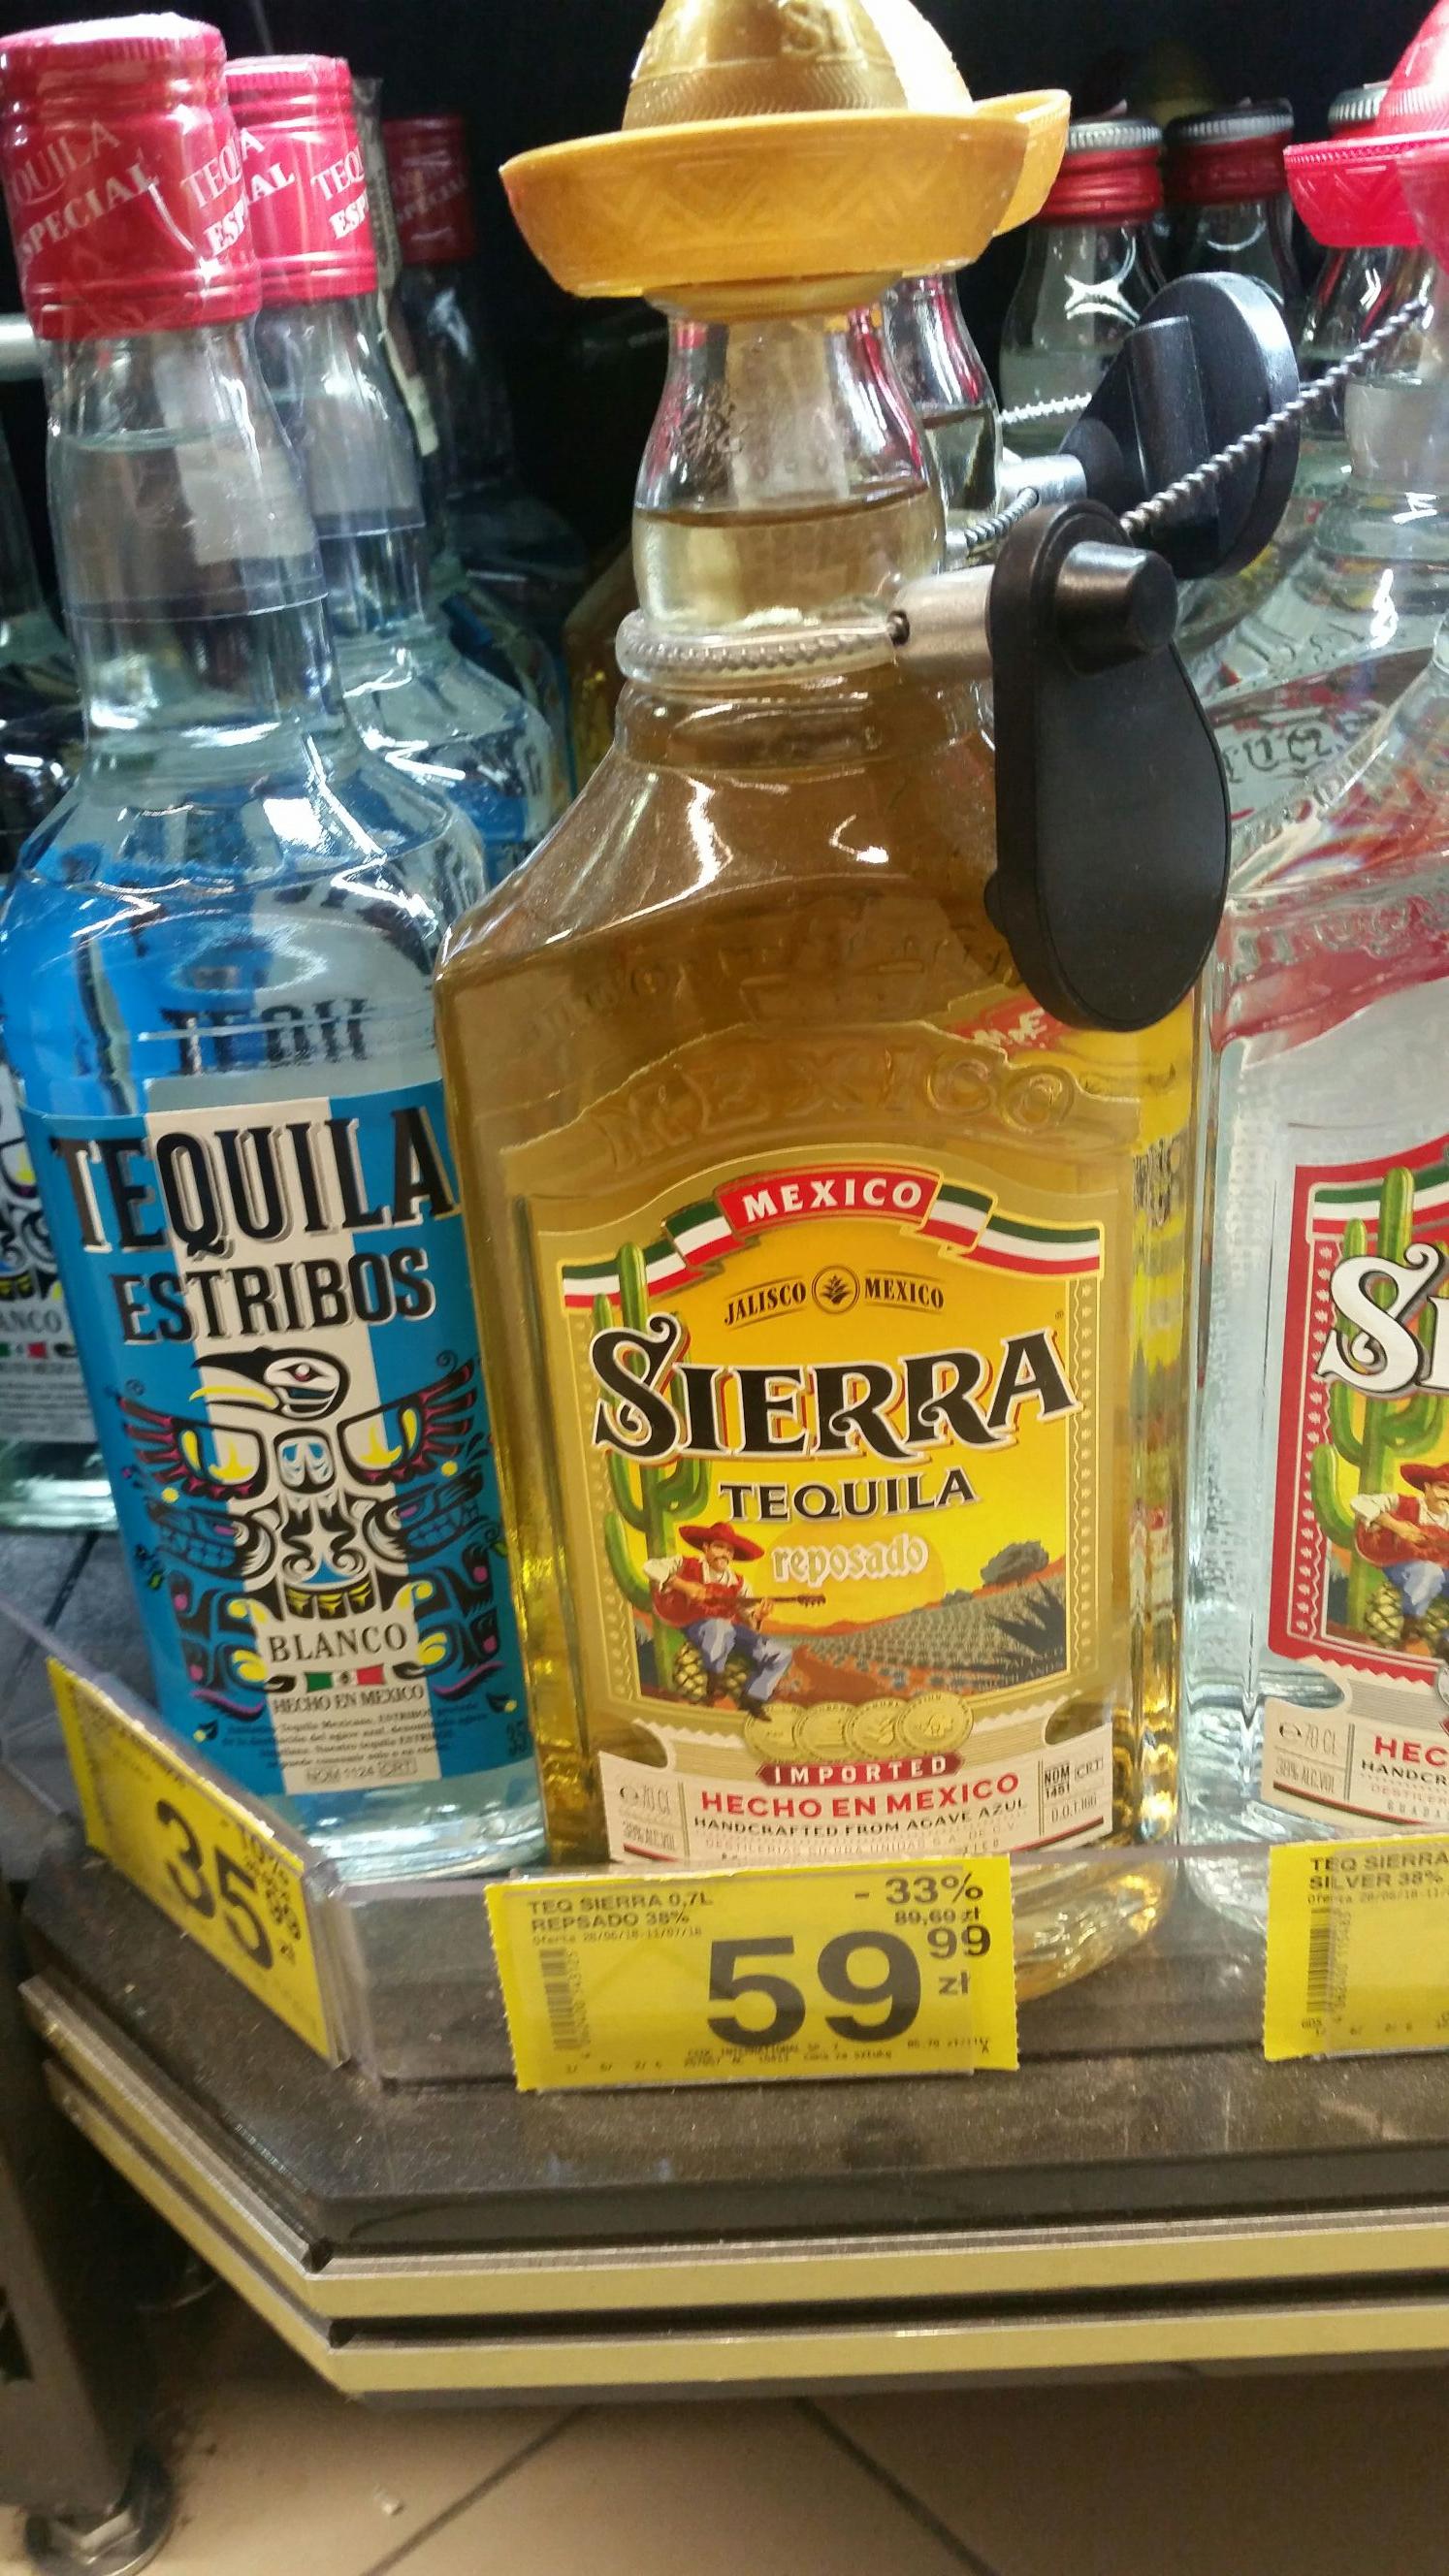 Carrefour Tequila Sierra reposado